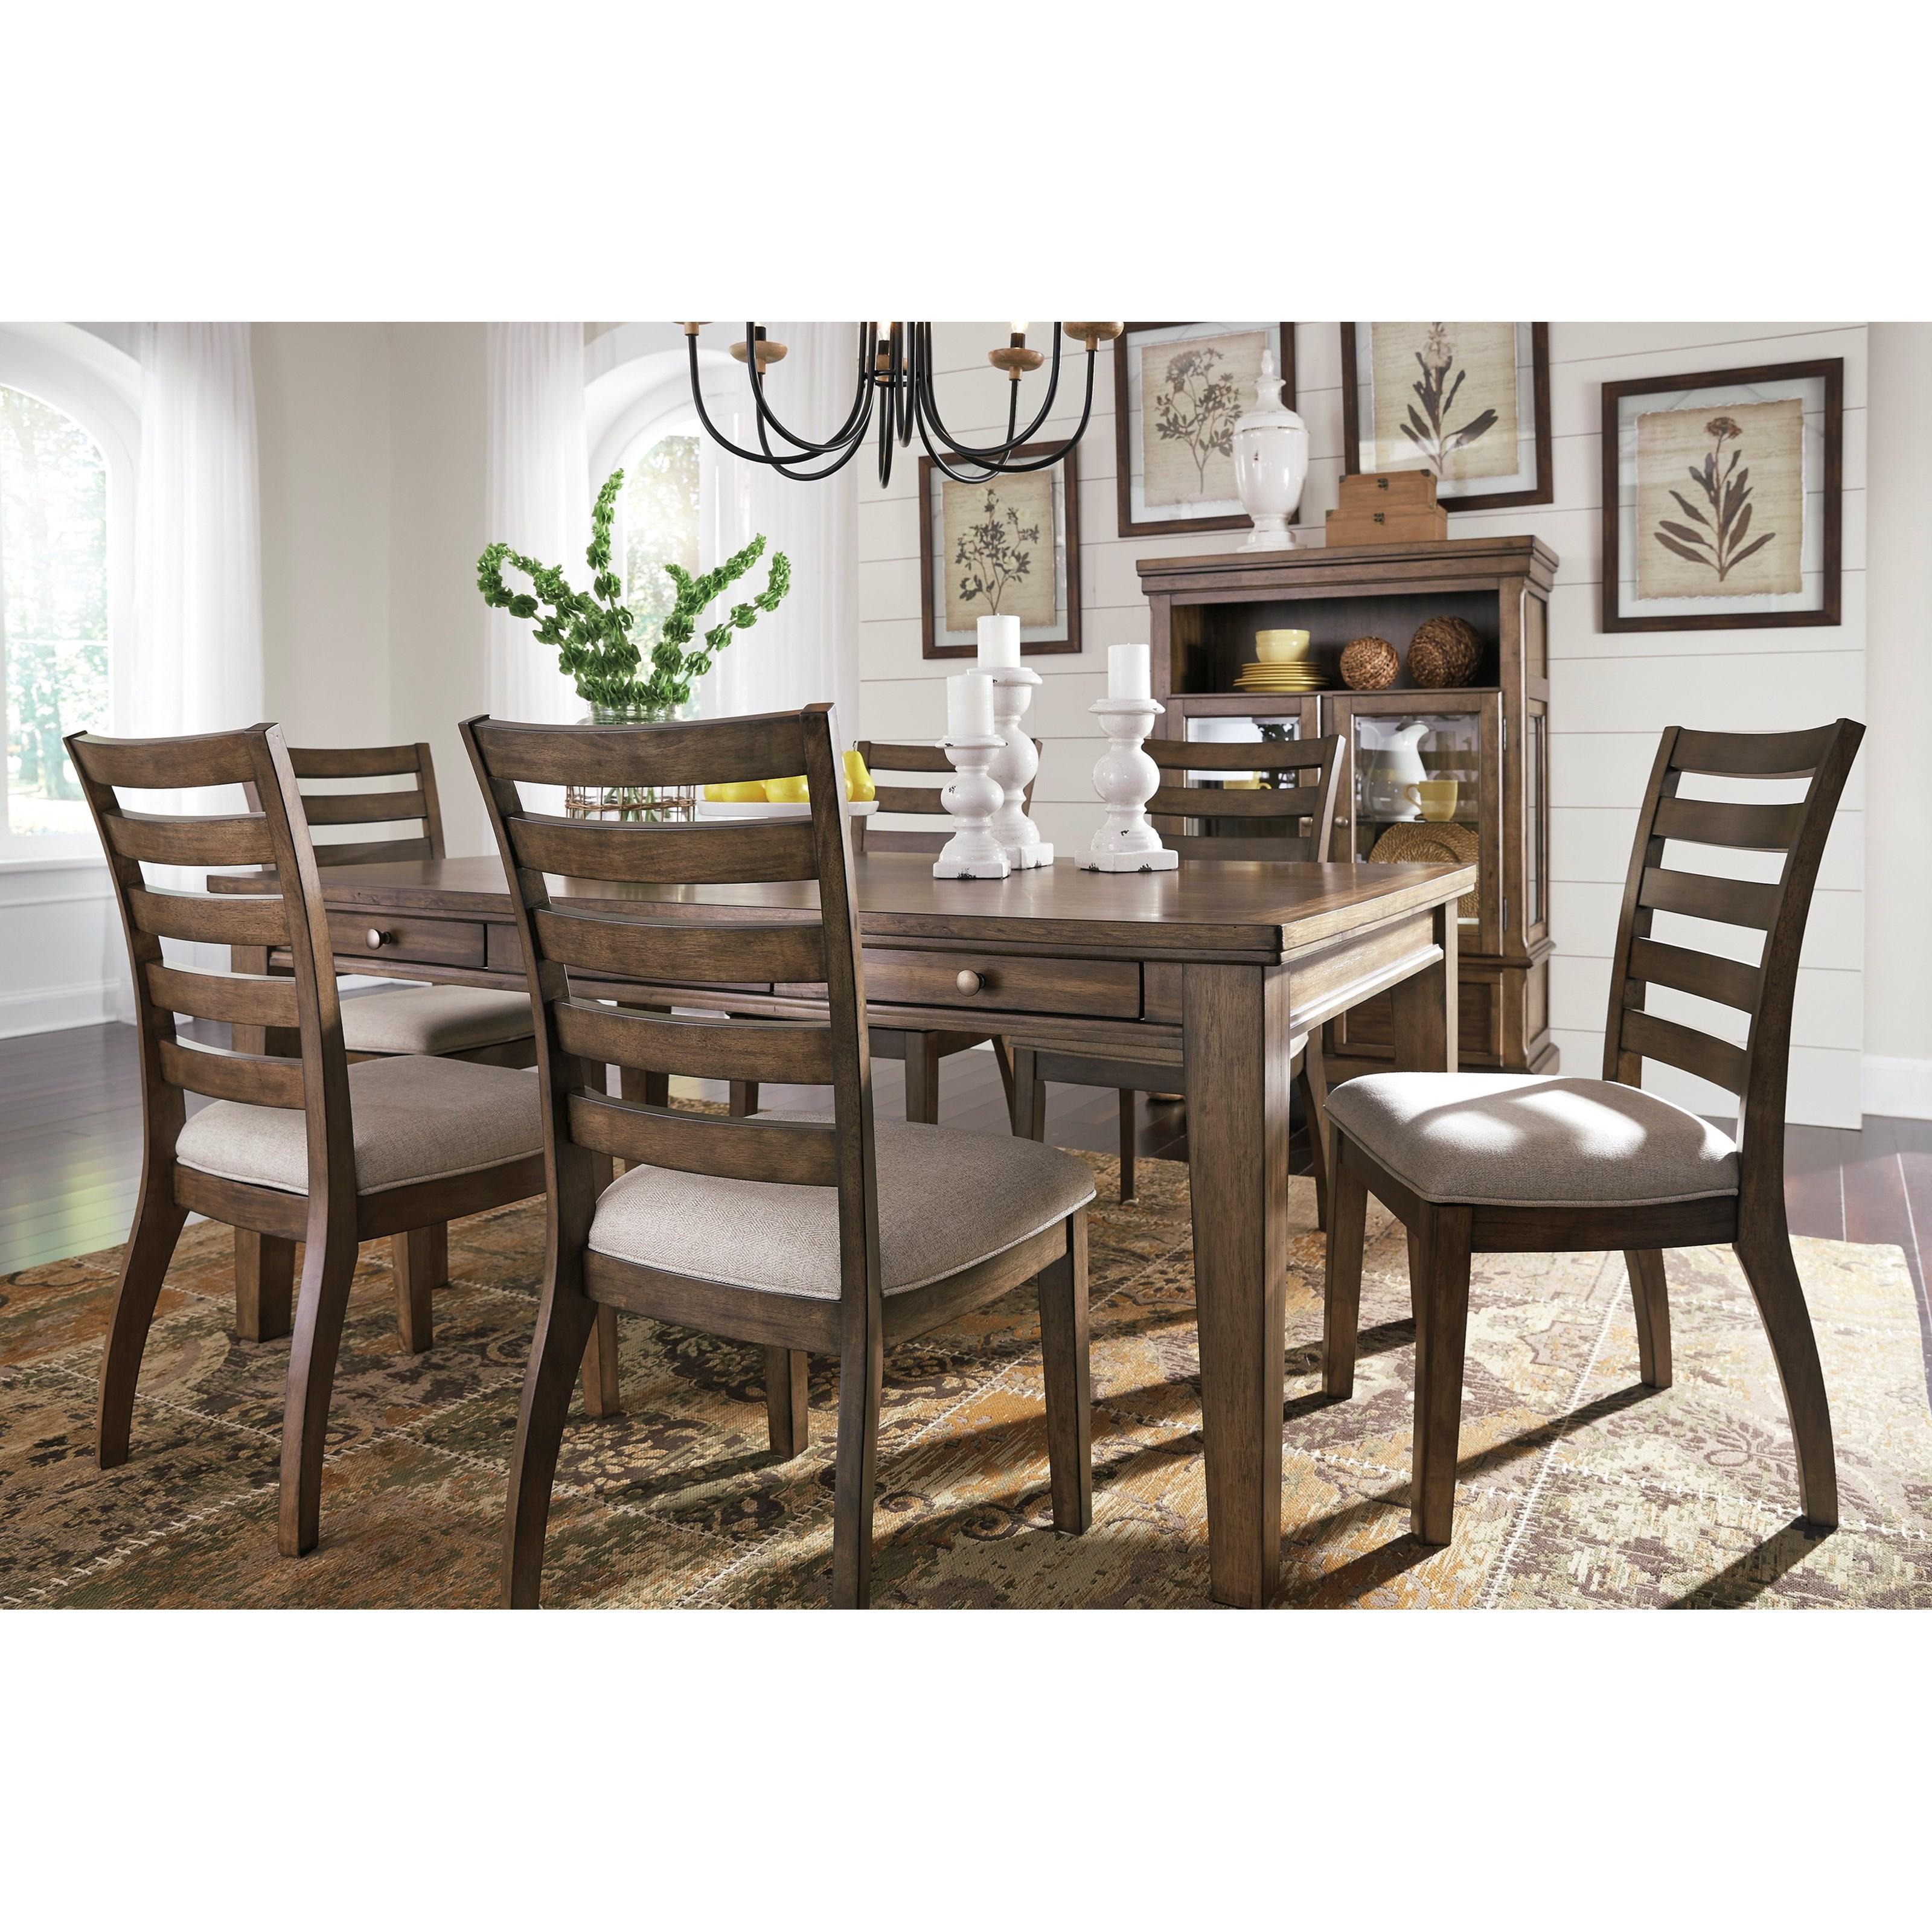 Ashley Dining Table: Signature Design By Ashley Flynnter D719-25 Rectangular